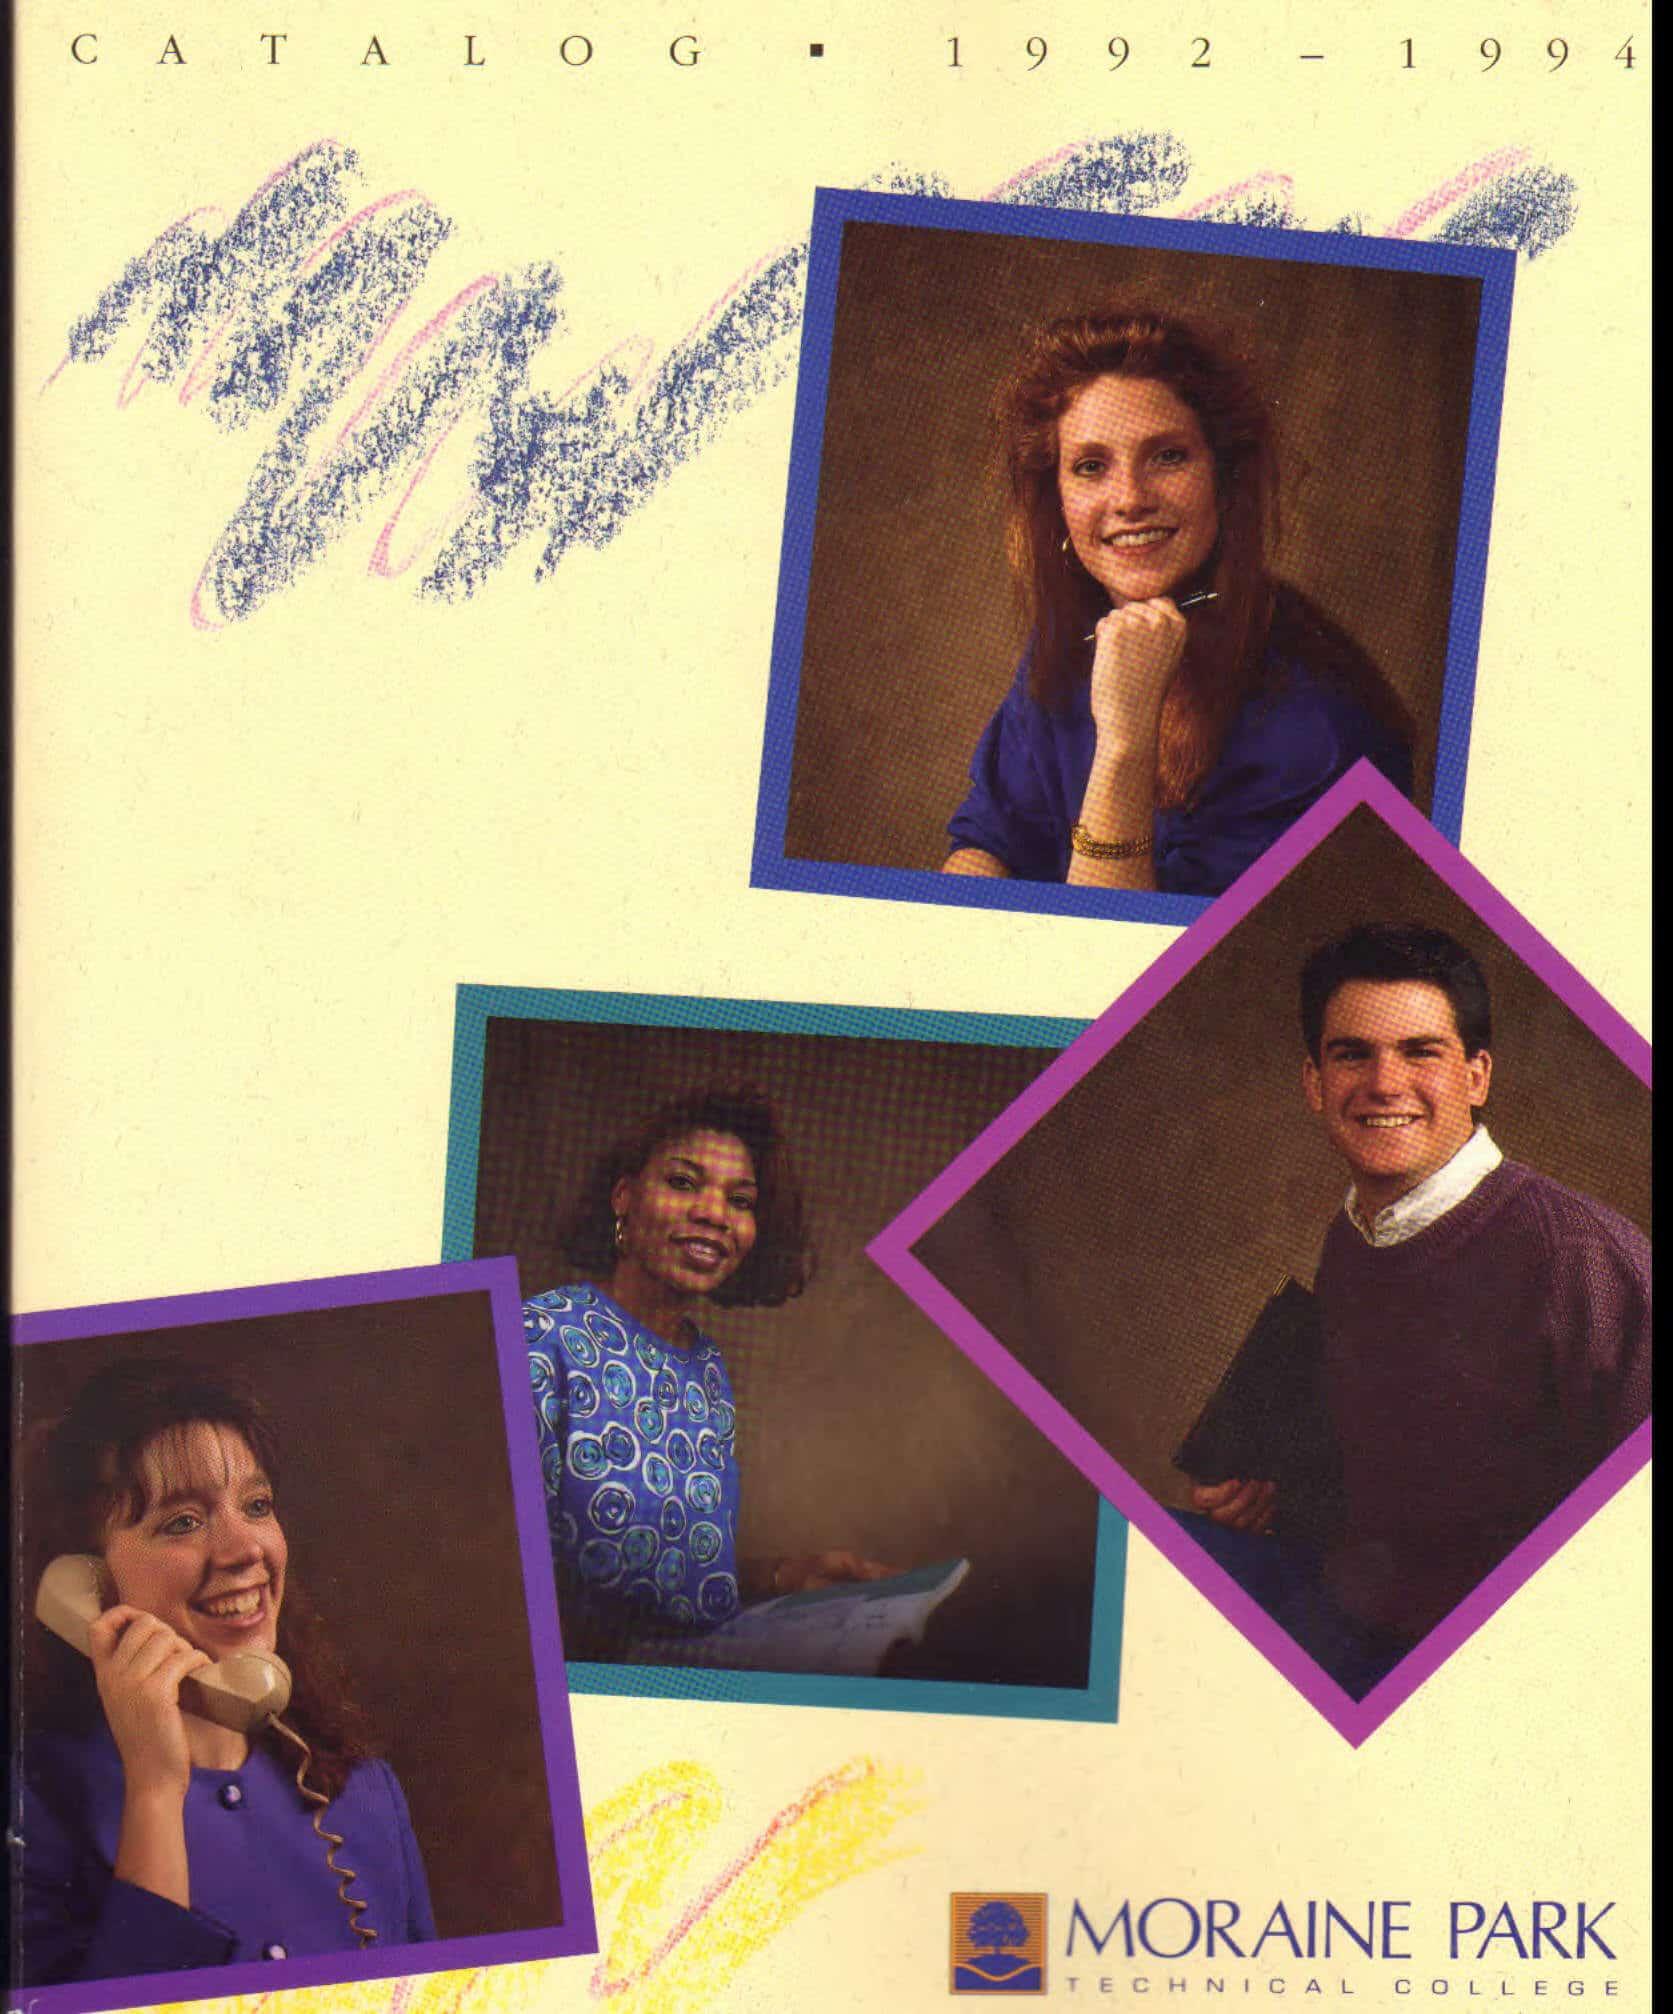 92-94 catalog